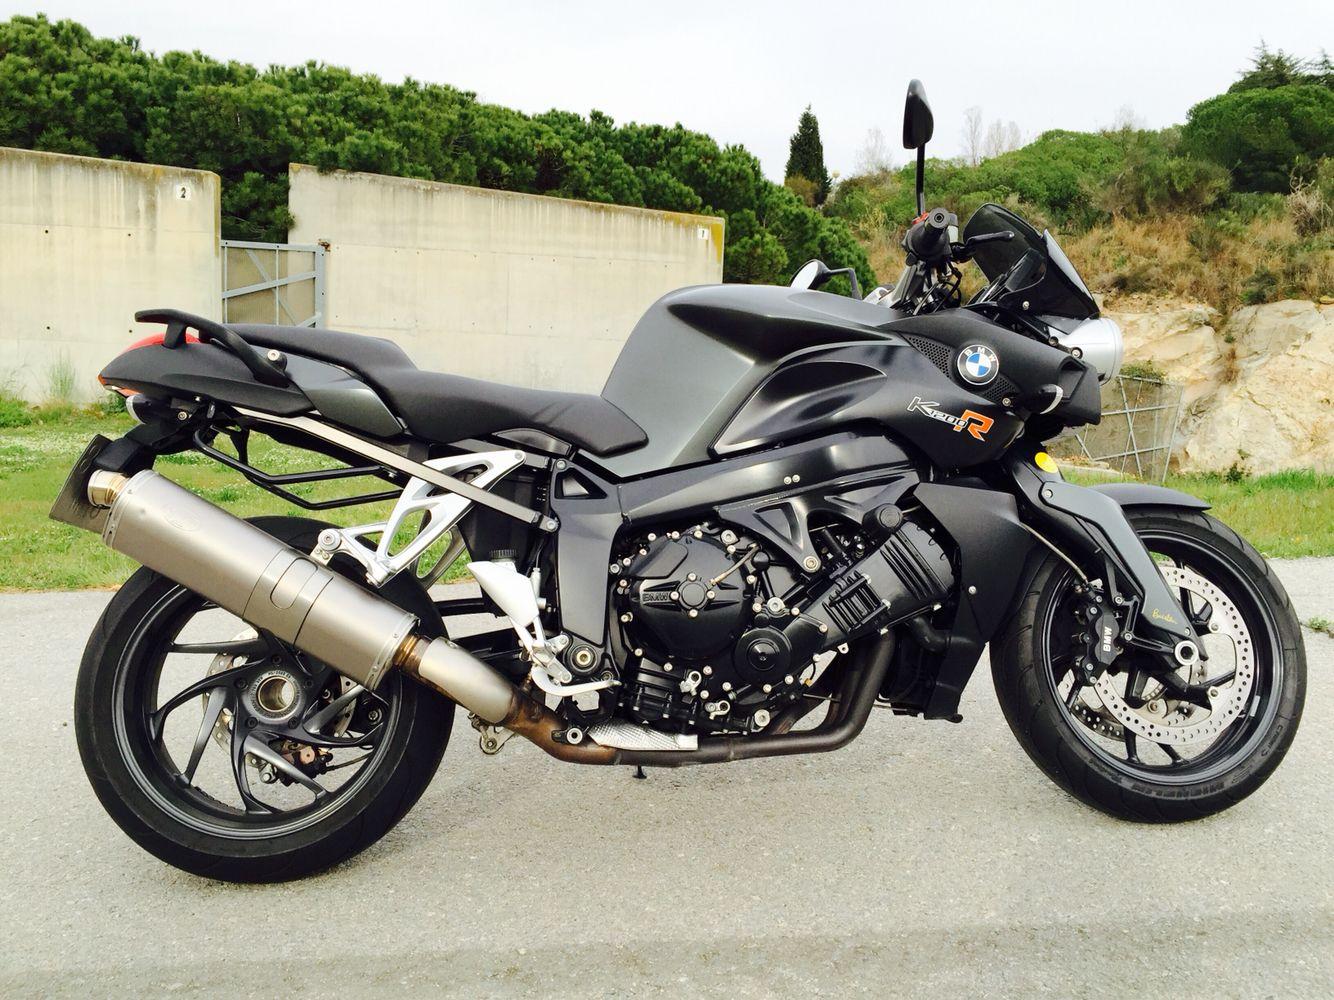 Bmw k1200r black